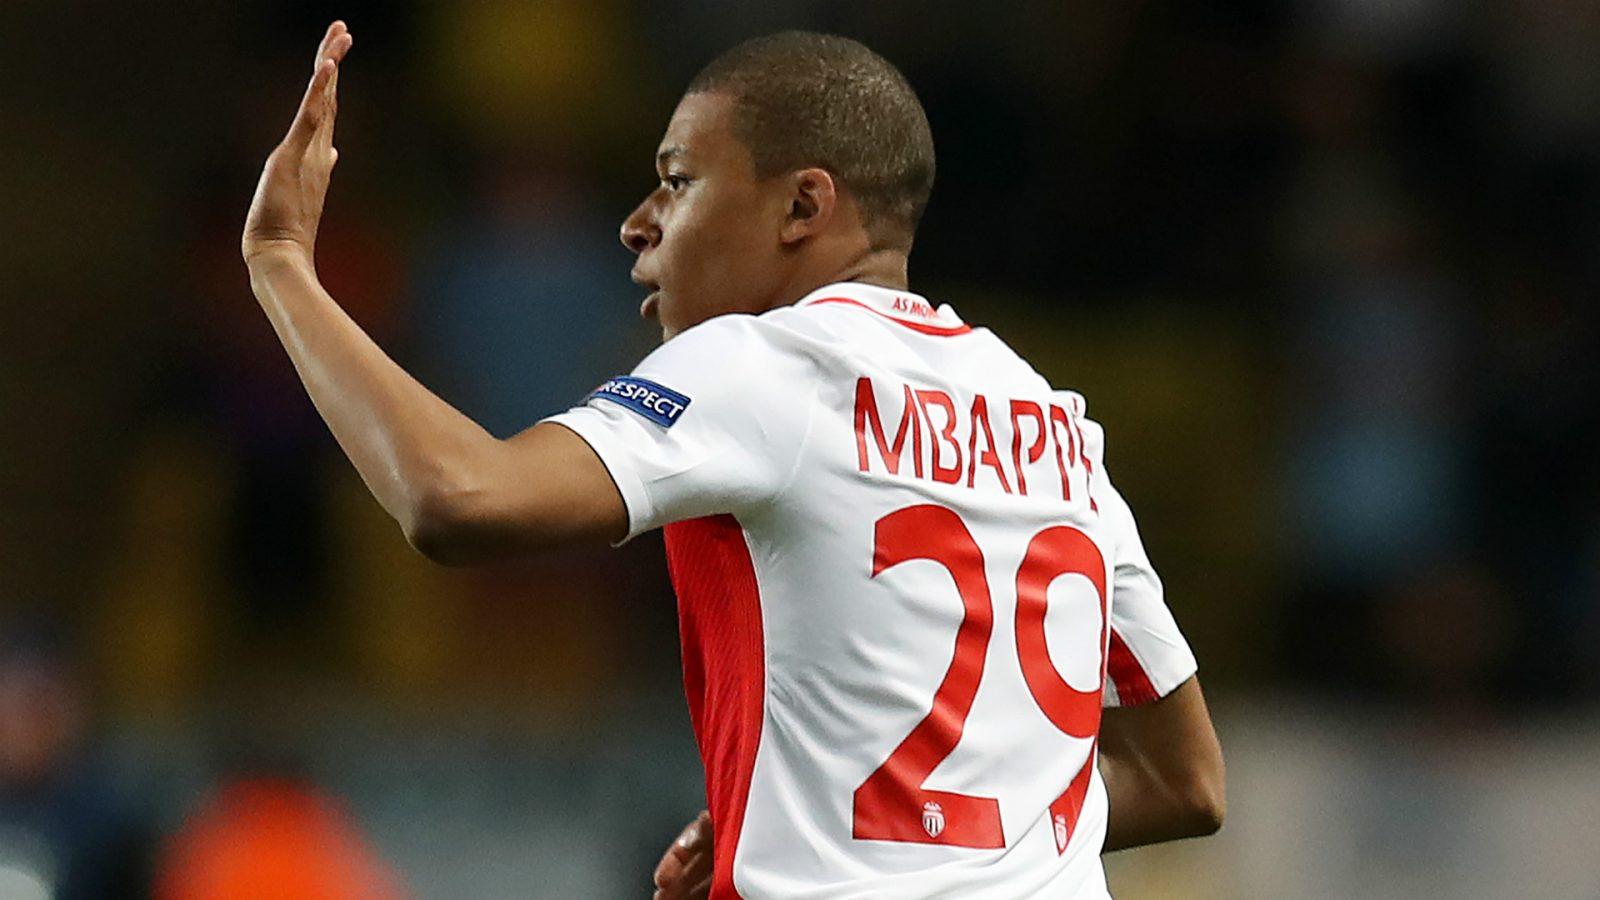 El verdadero valor de mercado de Kylian Mbappé